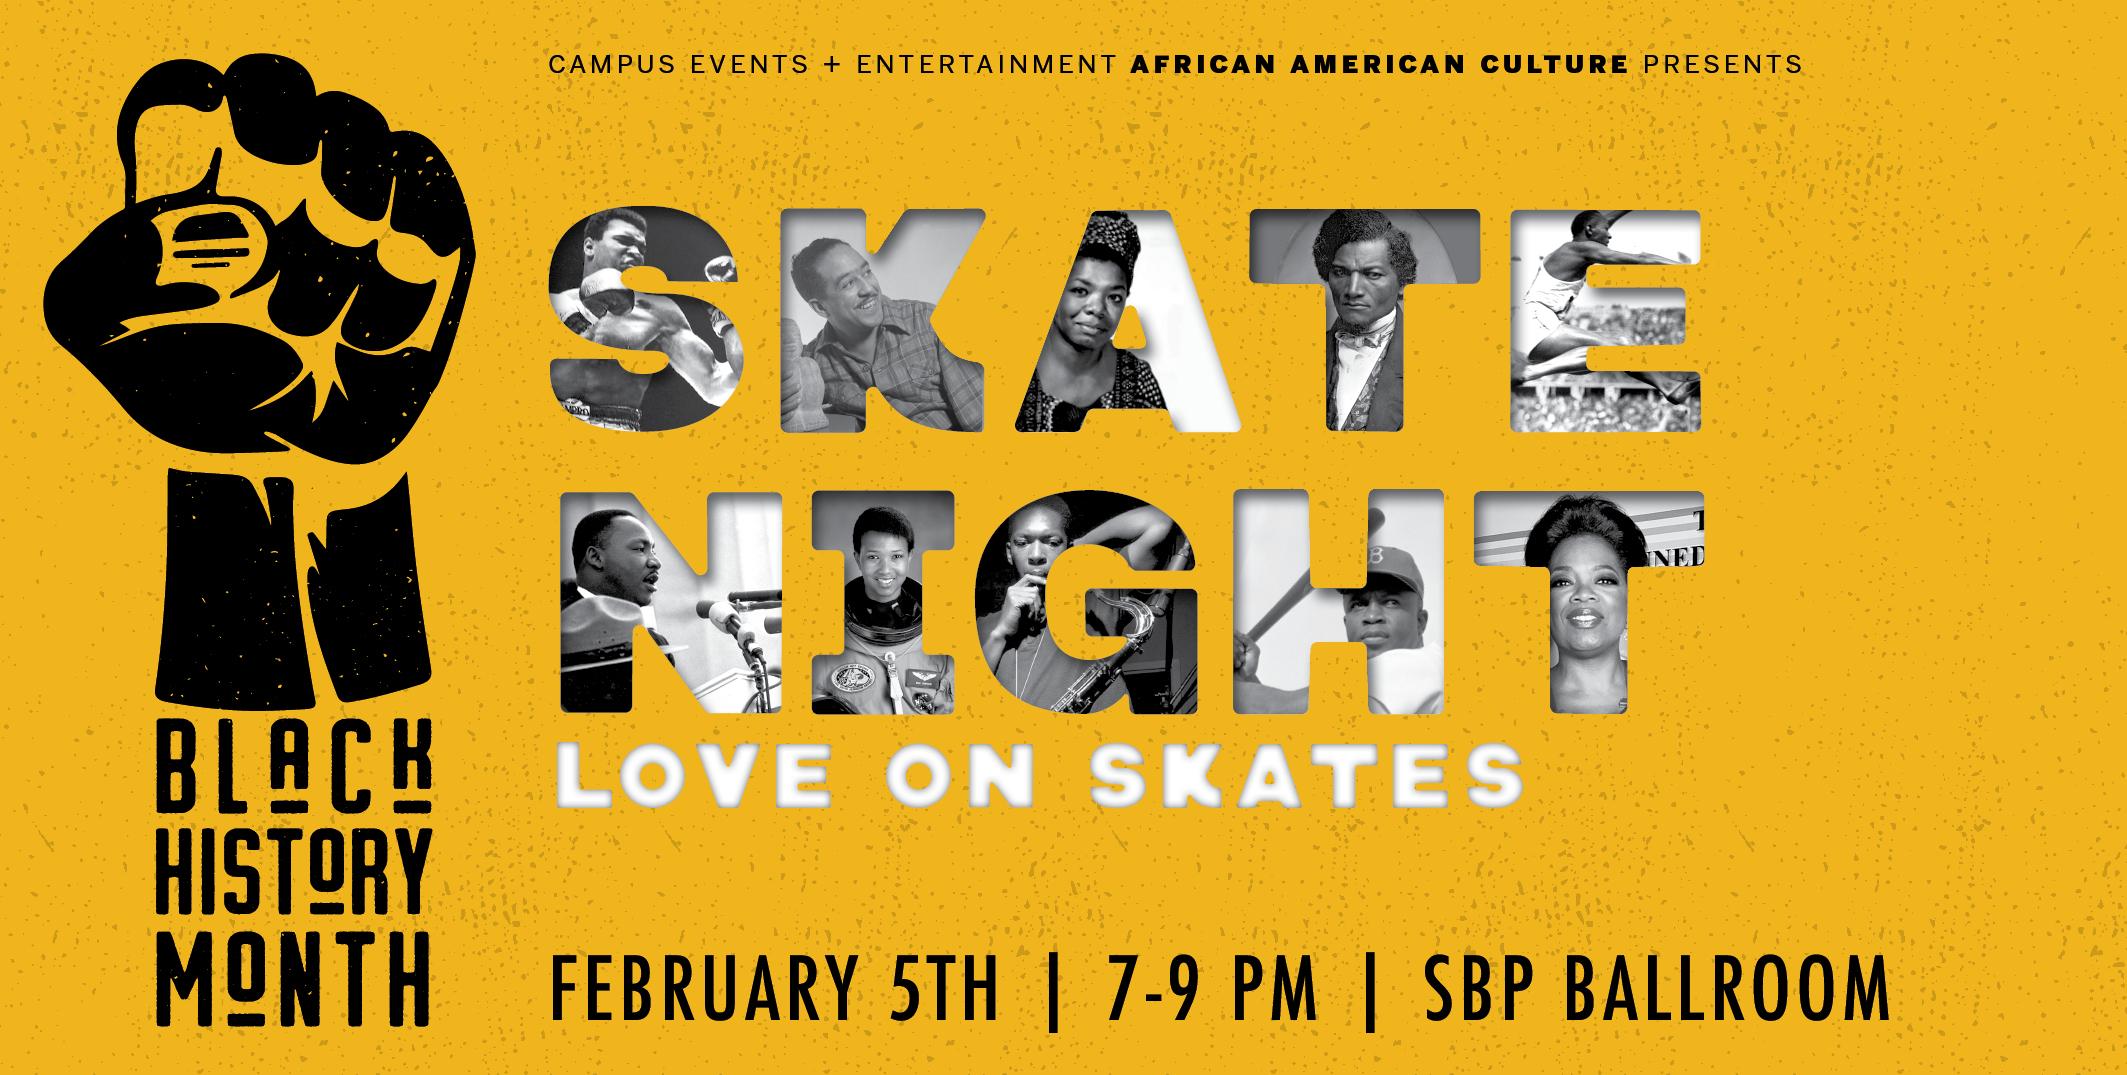 Love on Skates